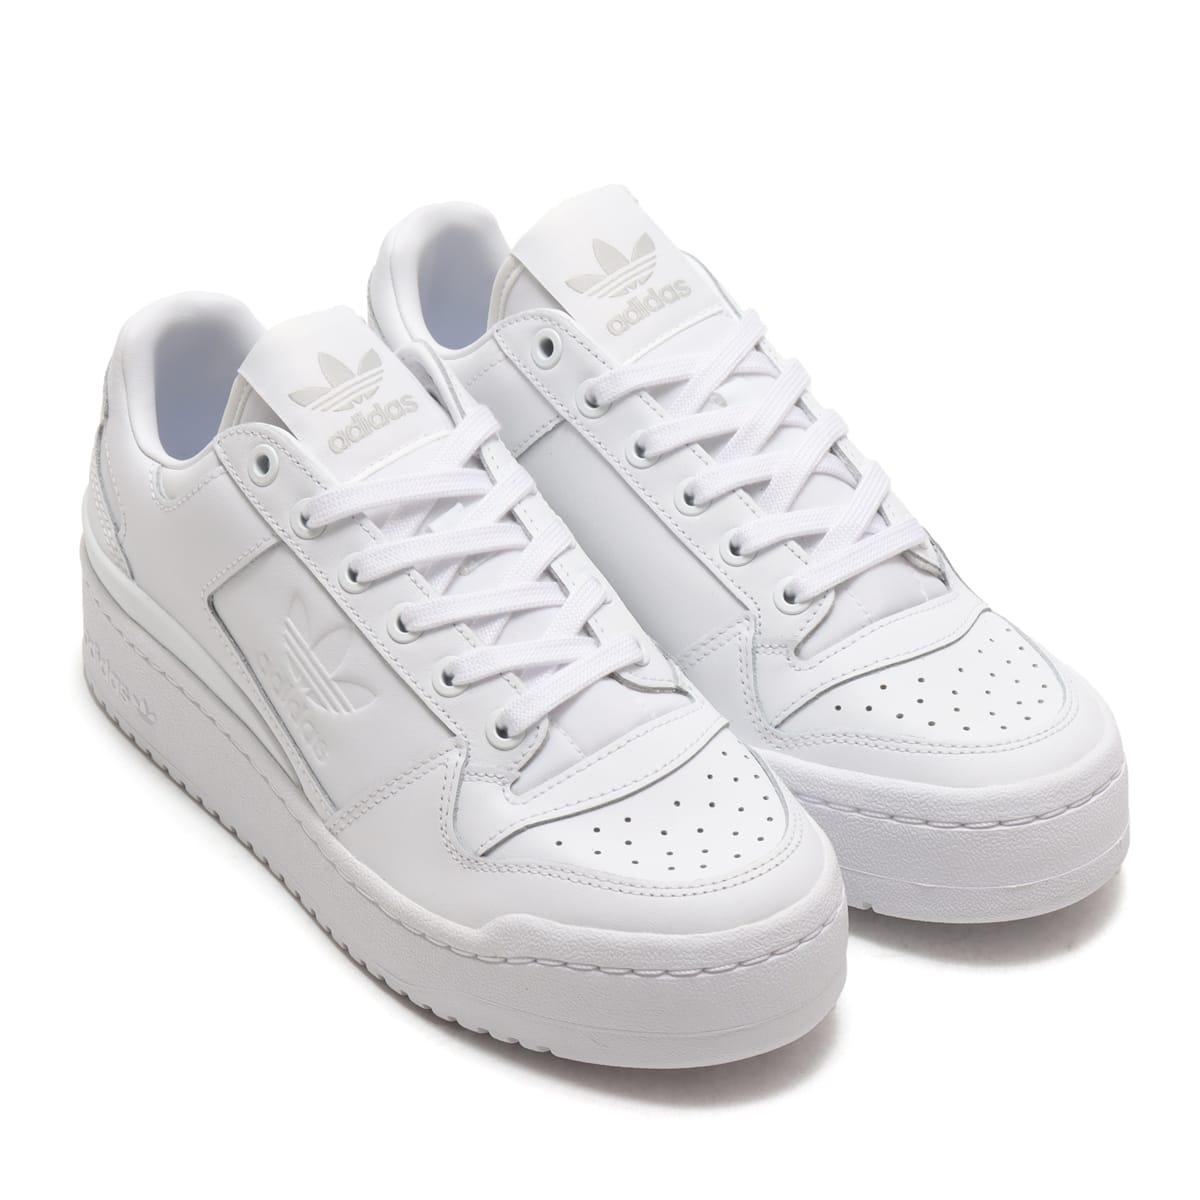 adidas FORUMBOLD W フットウェアホワイト/フットウェアホワイト/コアブラック 21SS-S_photo_large